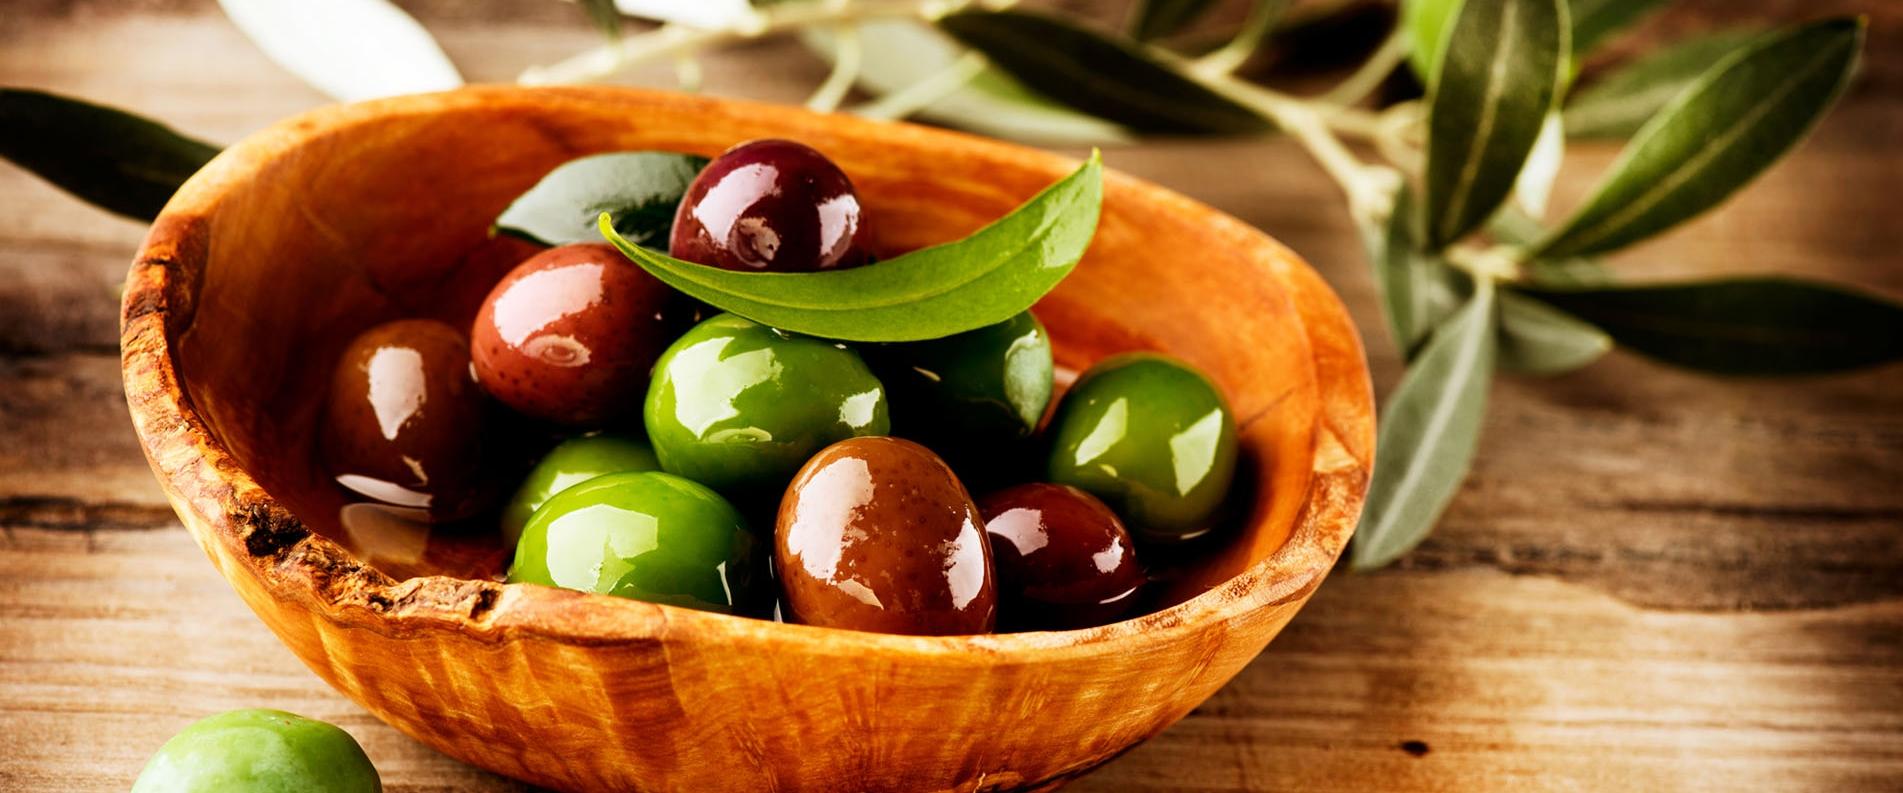 Оливки и оливковое масло — золото Кипра